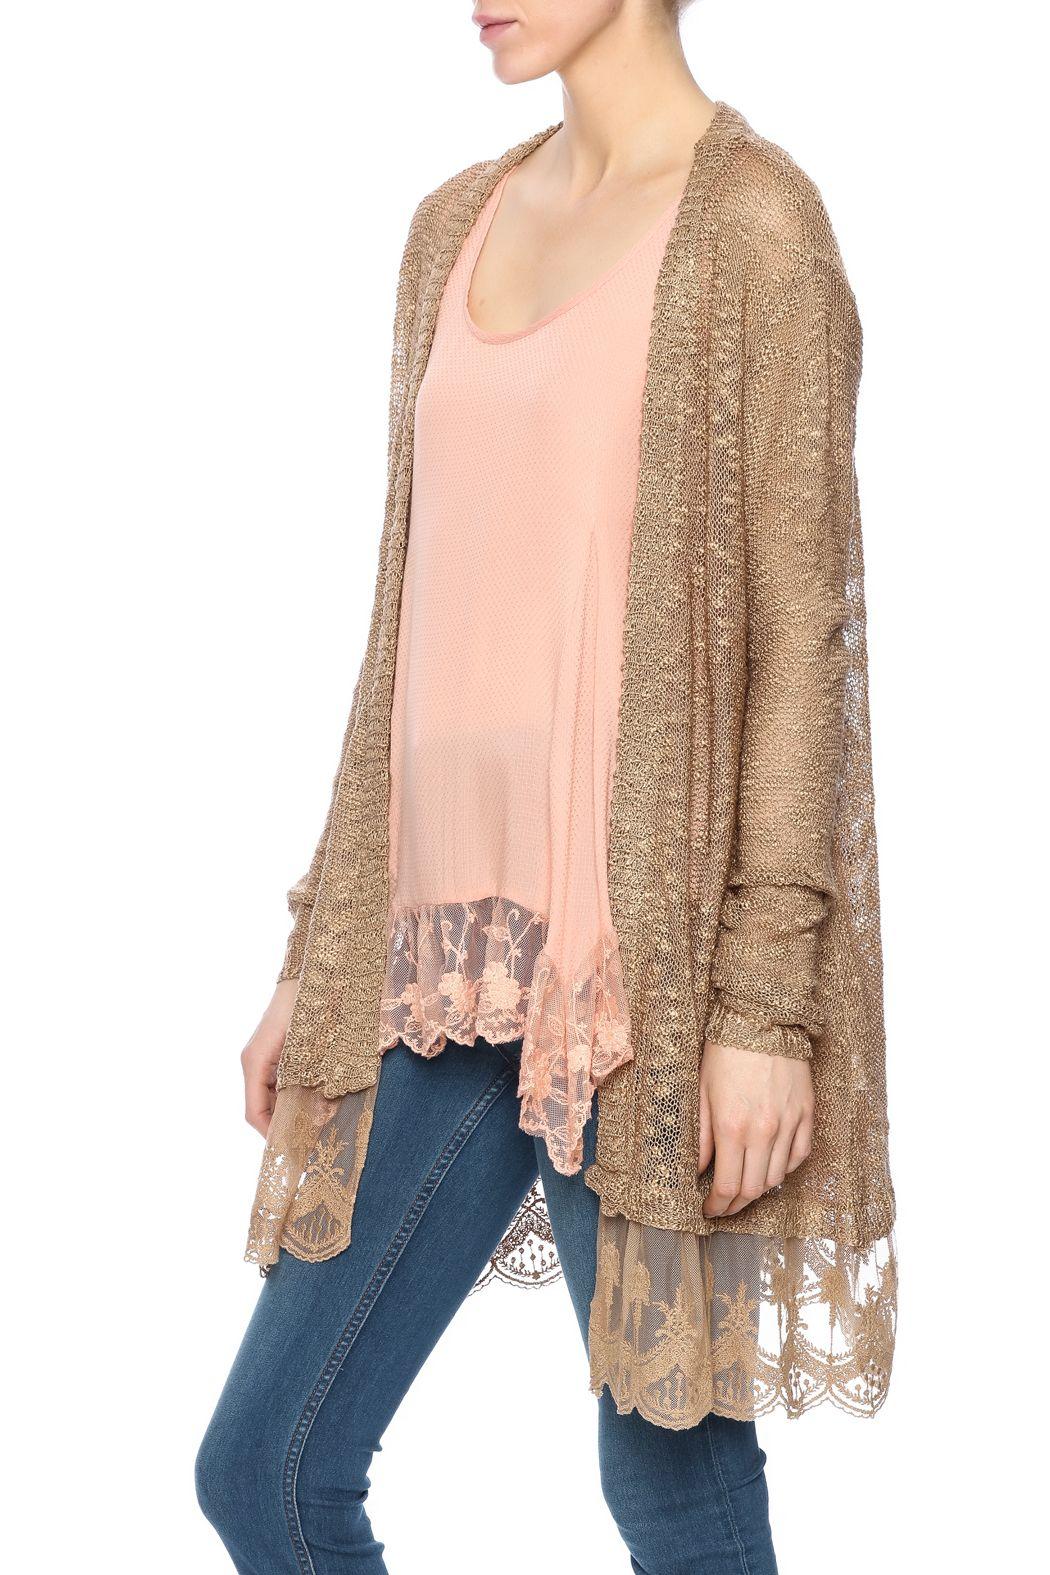 Nadya's Closet Lace Longline Cardigan | Longline cardigan and Boutique